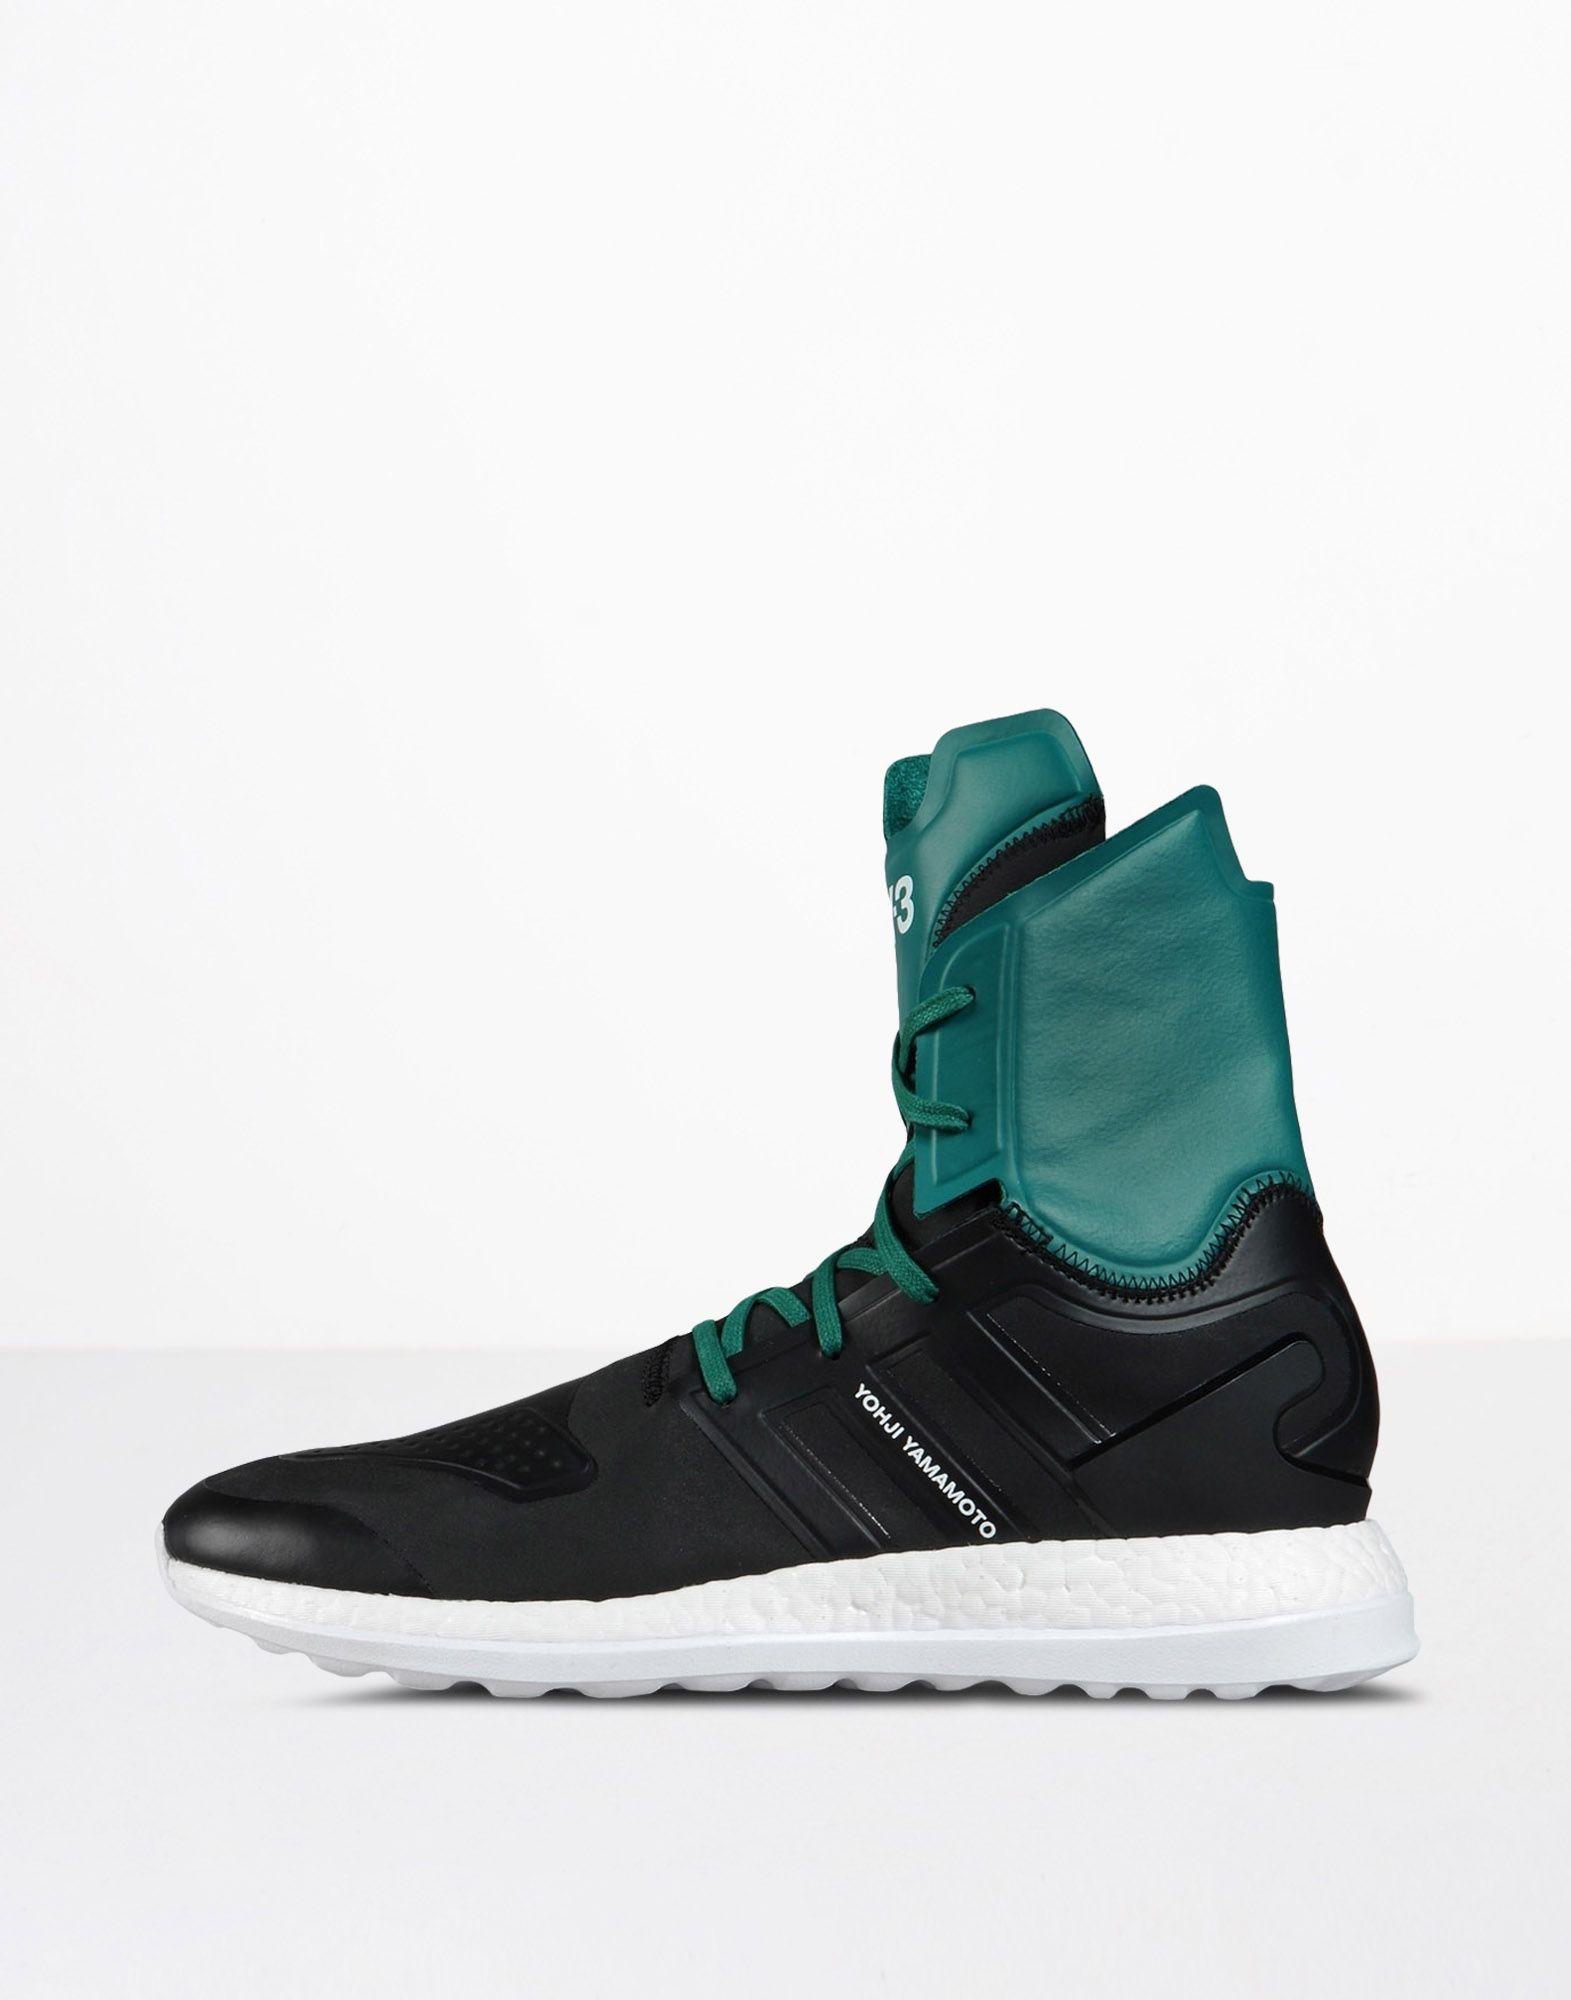 e2639b3c1ef66 ... Y-3 Y-3 PUREBOOST ZG HIGH High-top sneakers Man ...